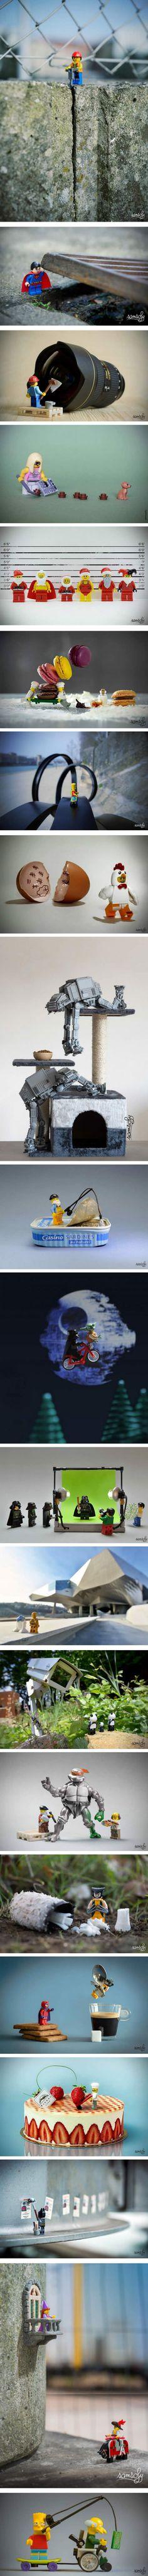 LEGO's Epic Adventures (Part 1) (By Samsofy)